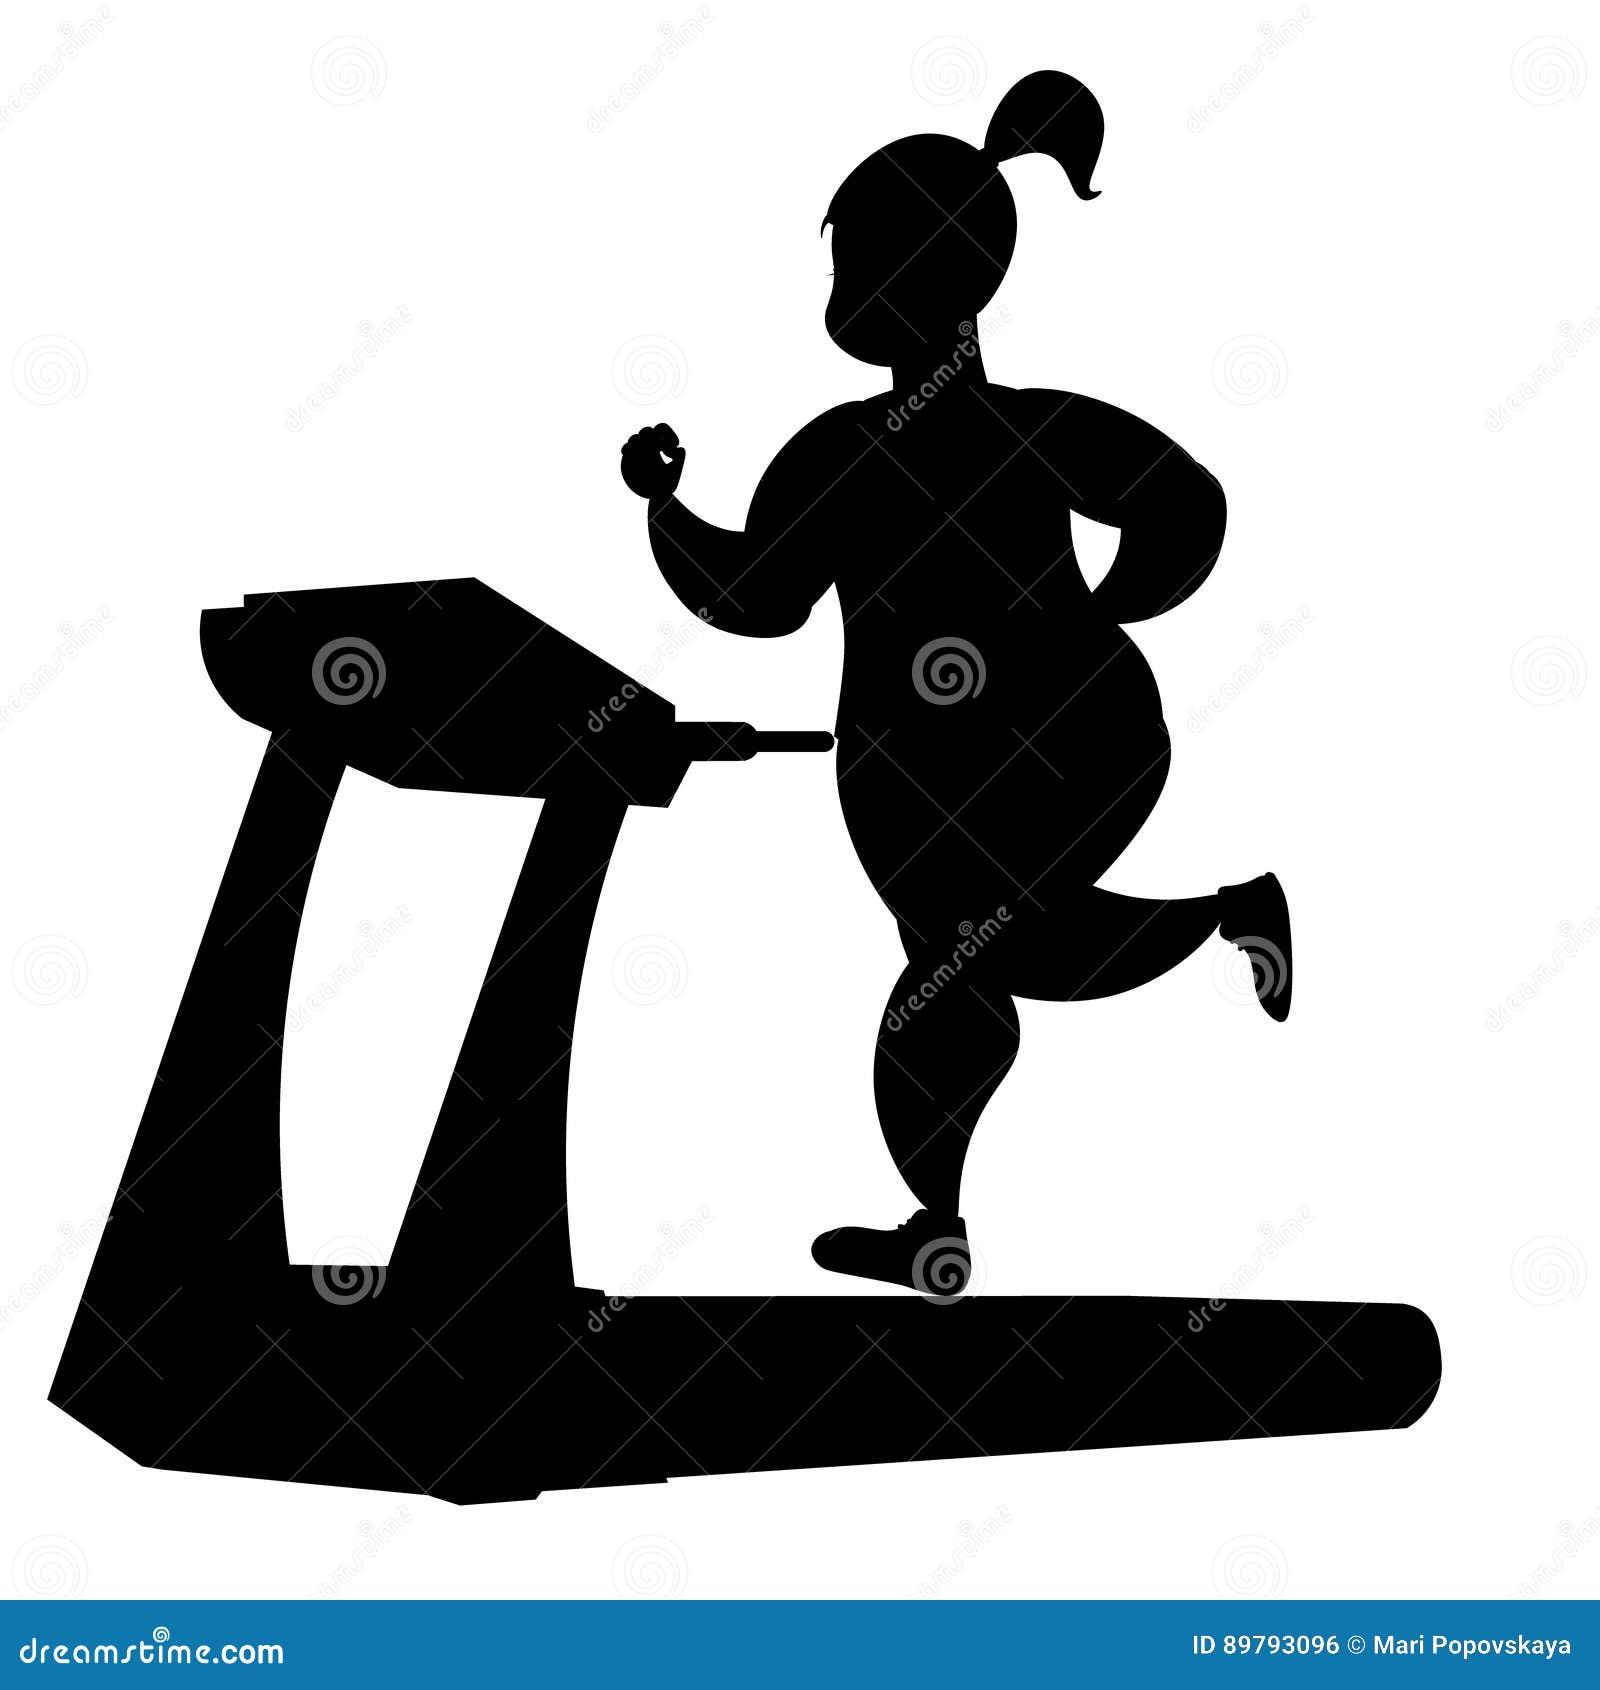 Girl silhouette running on a treadmill.